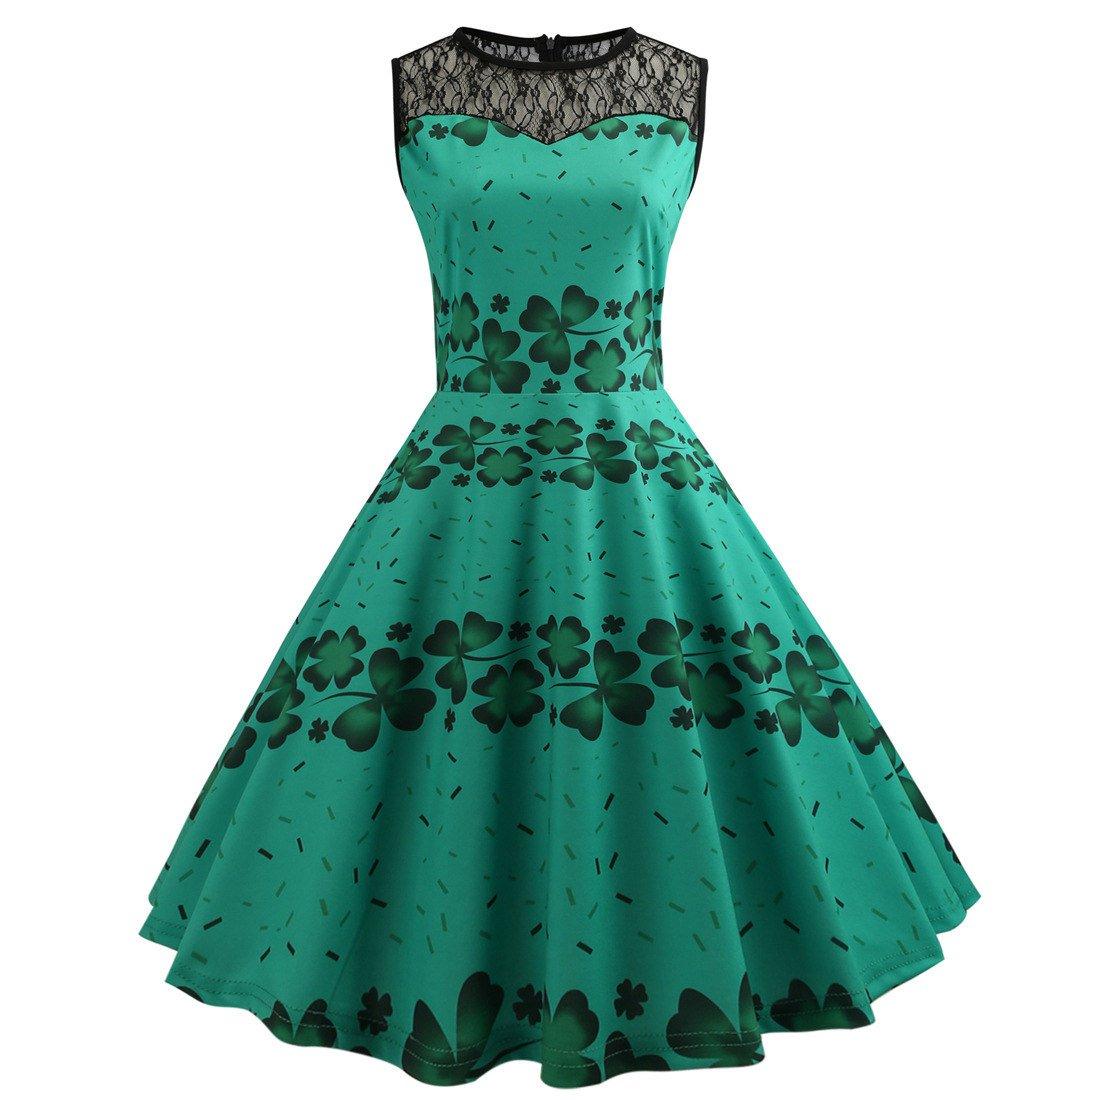 Fashion Ireland Streetwear Shamrocks Print Retro Party Dresses St. Patrick's Day Vintage Dress